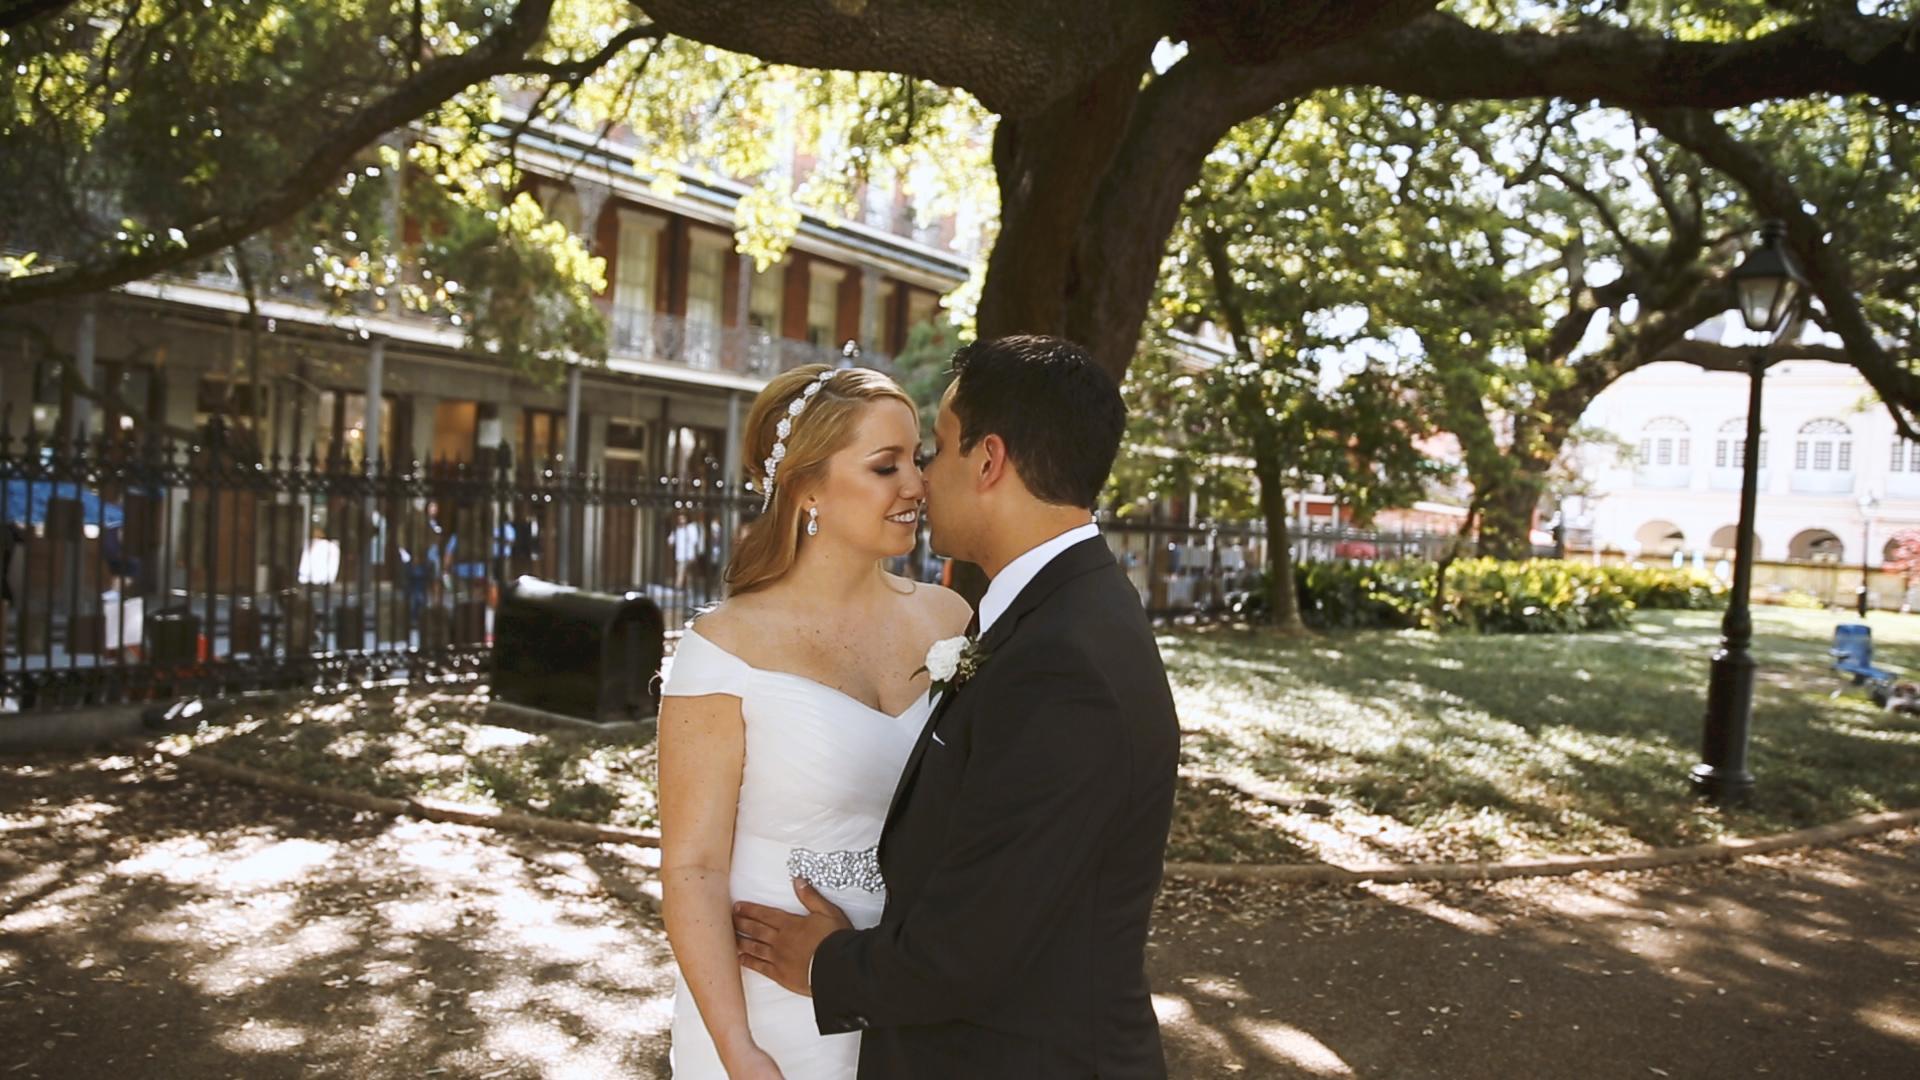 St. Louis Cathedral Wedding - Bride Film